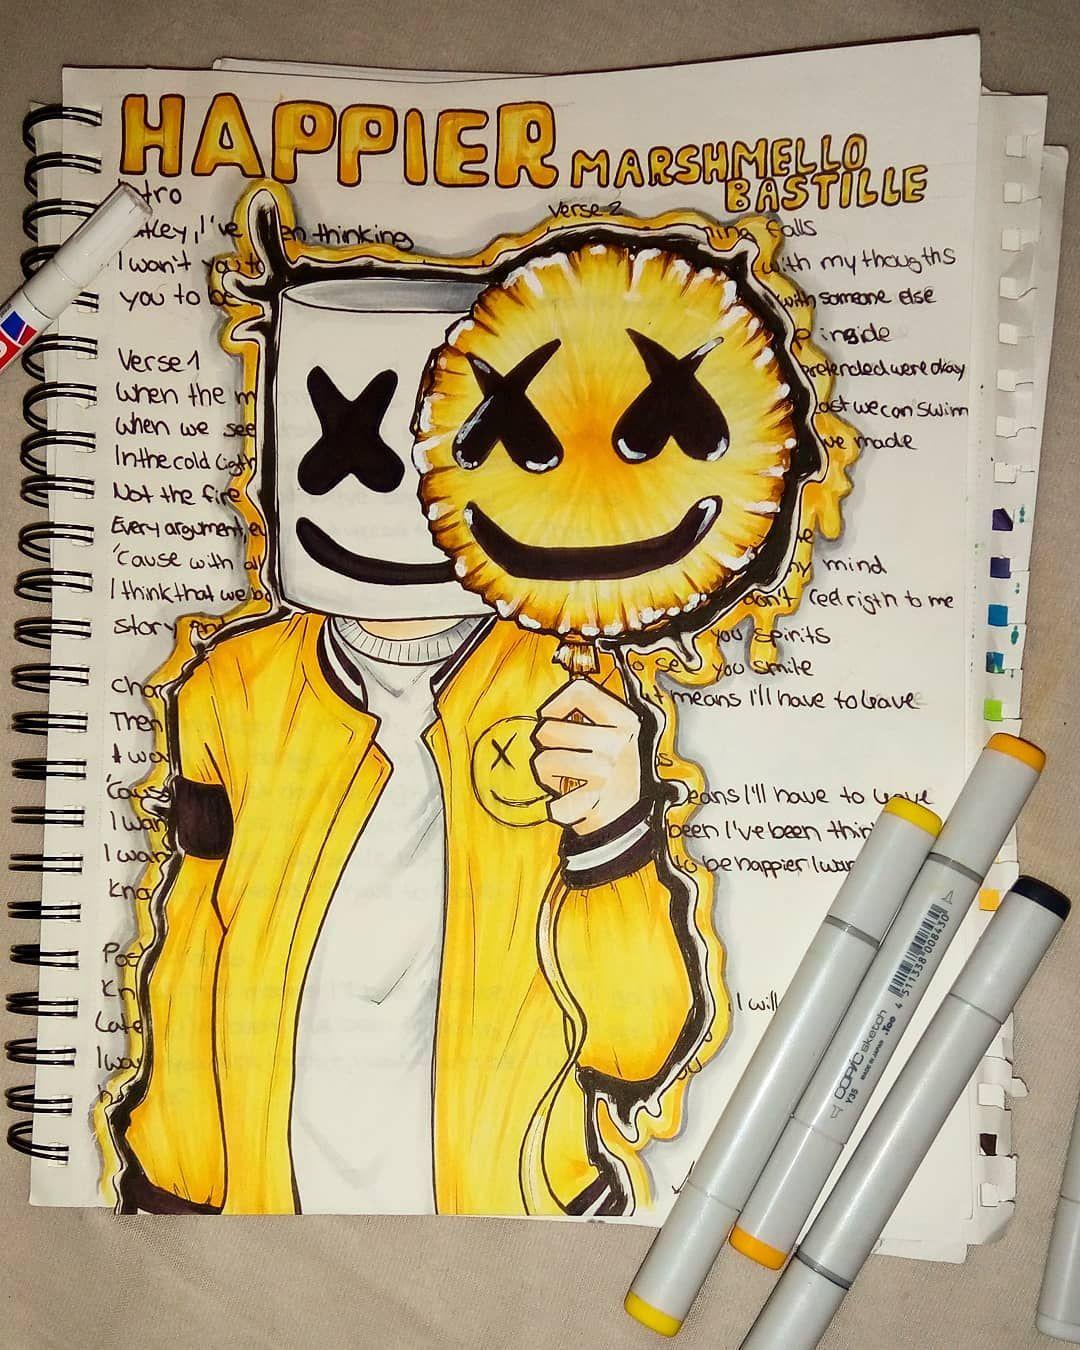 "Marshmello Bastille Happier: ""Lately I've Been Thinking I Want You To Be Happier"